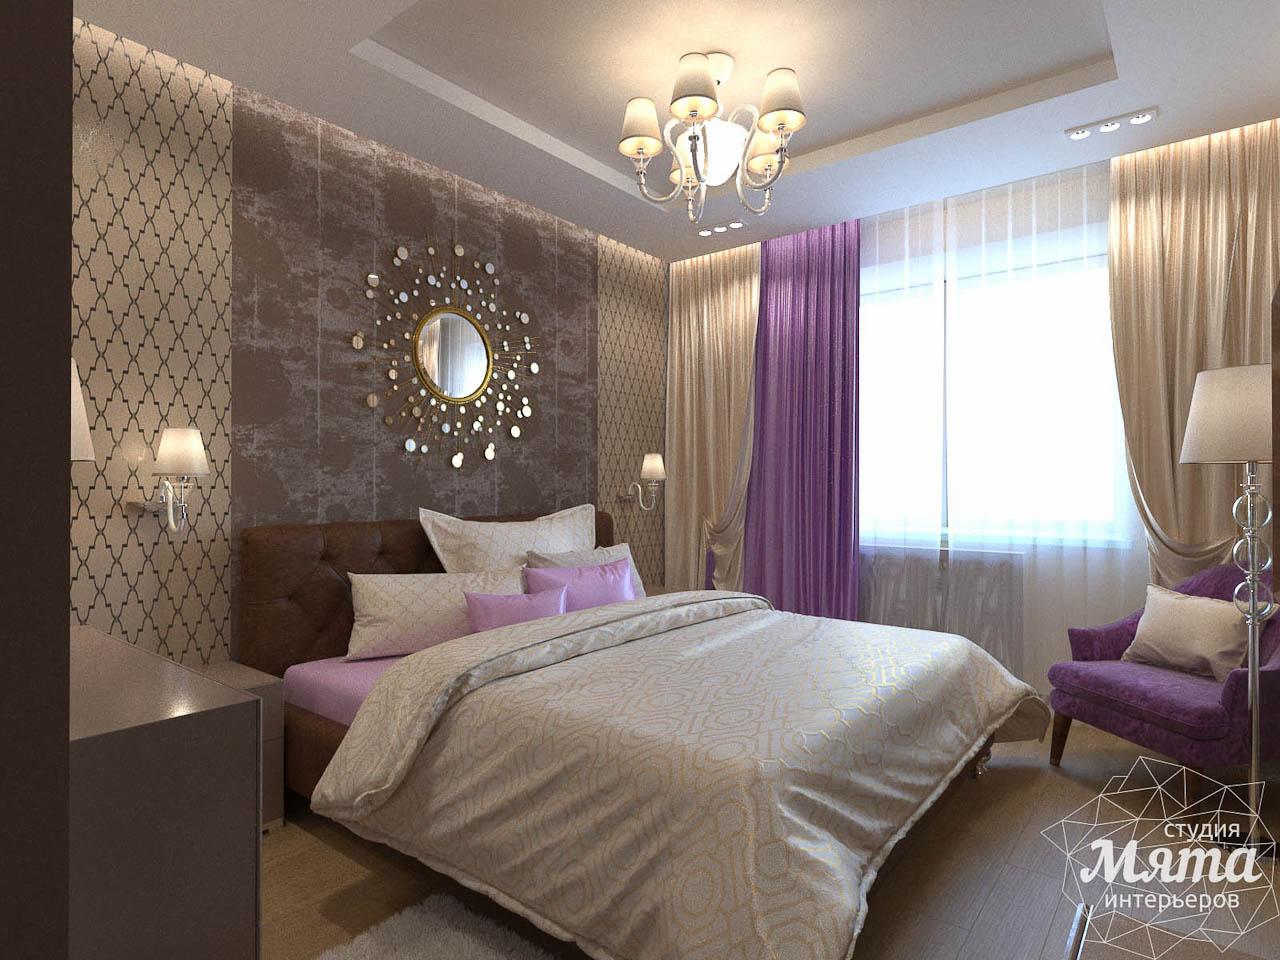 Дизайн интерьера трехкомнатной квартиры по ул. Мельникова 27 img633922343